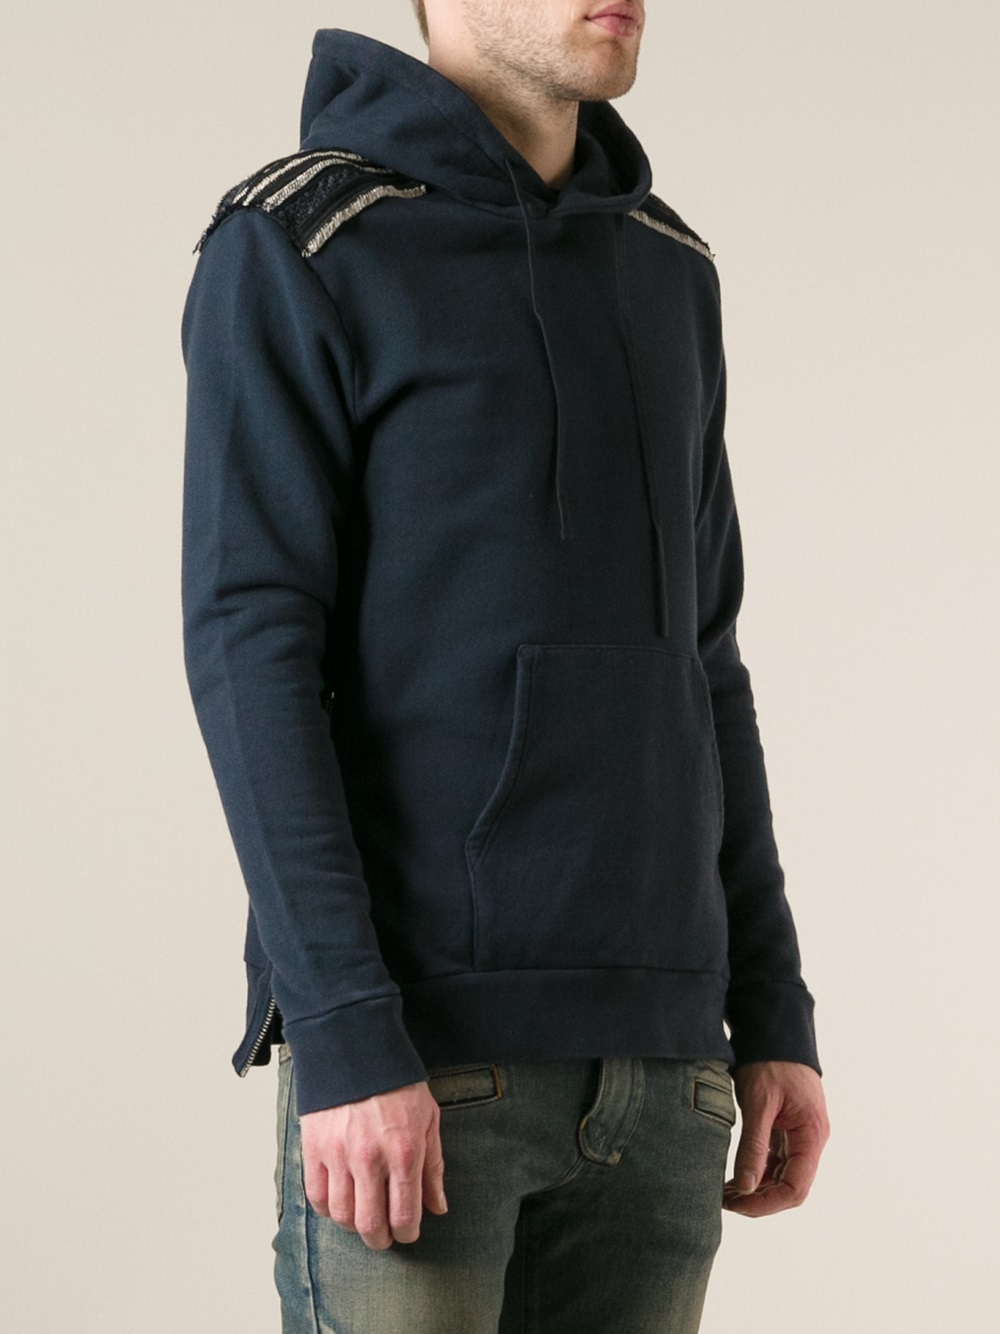 Balmain Seam Detail Hoodie in Blue for Men